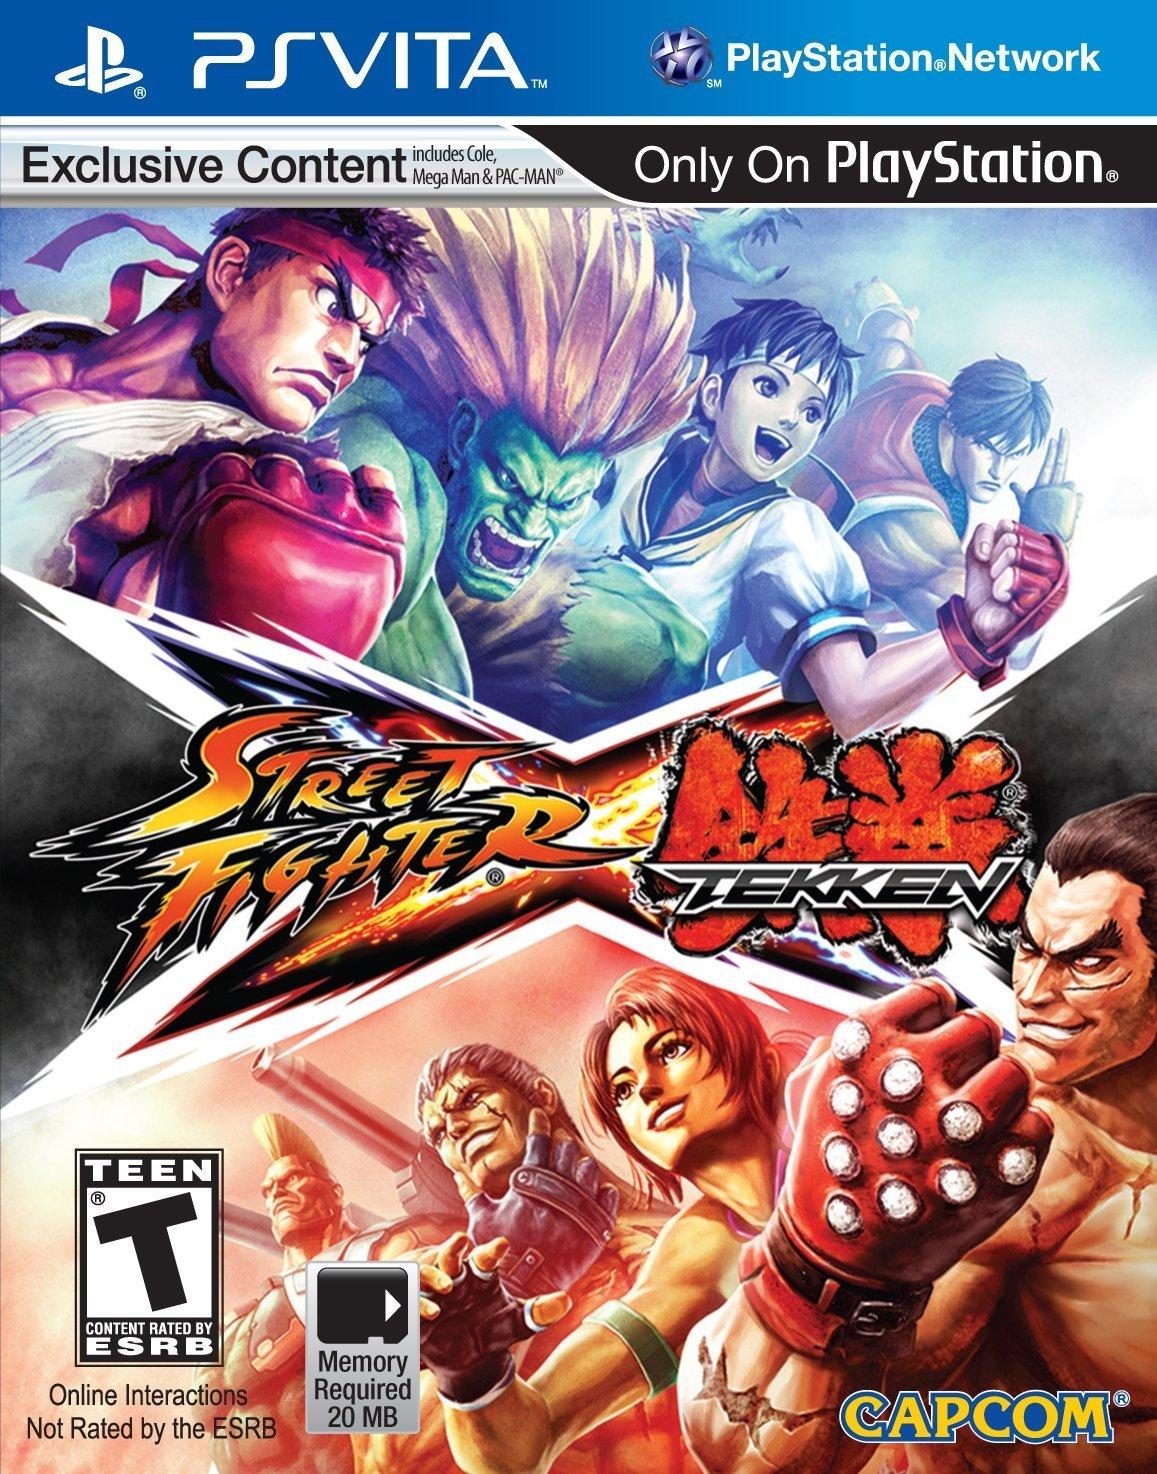 PSV  快打旋風 X 鐵拳(含12名追加角色包下載卡) -英日文美版- Street Fighter X Tekken